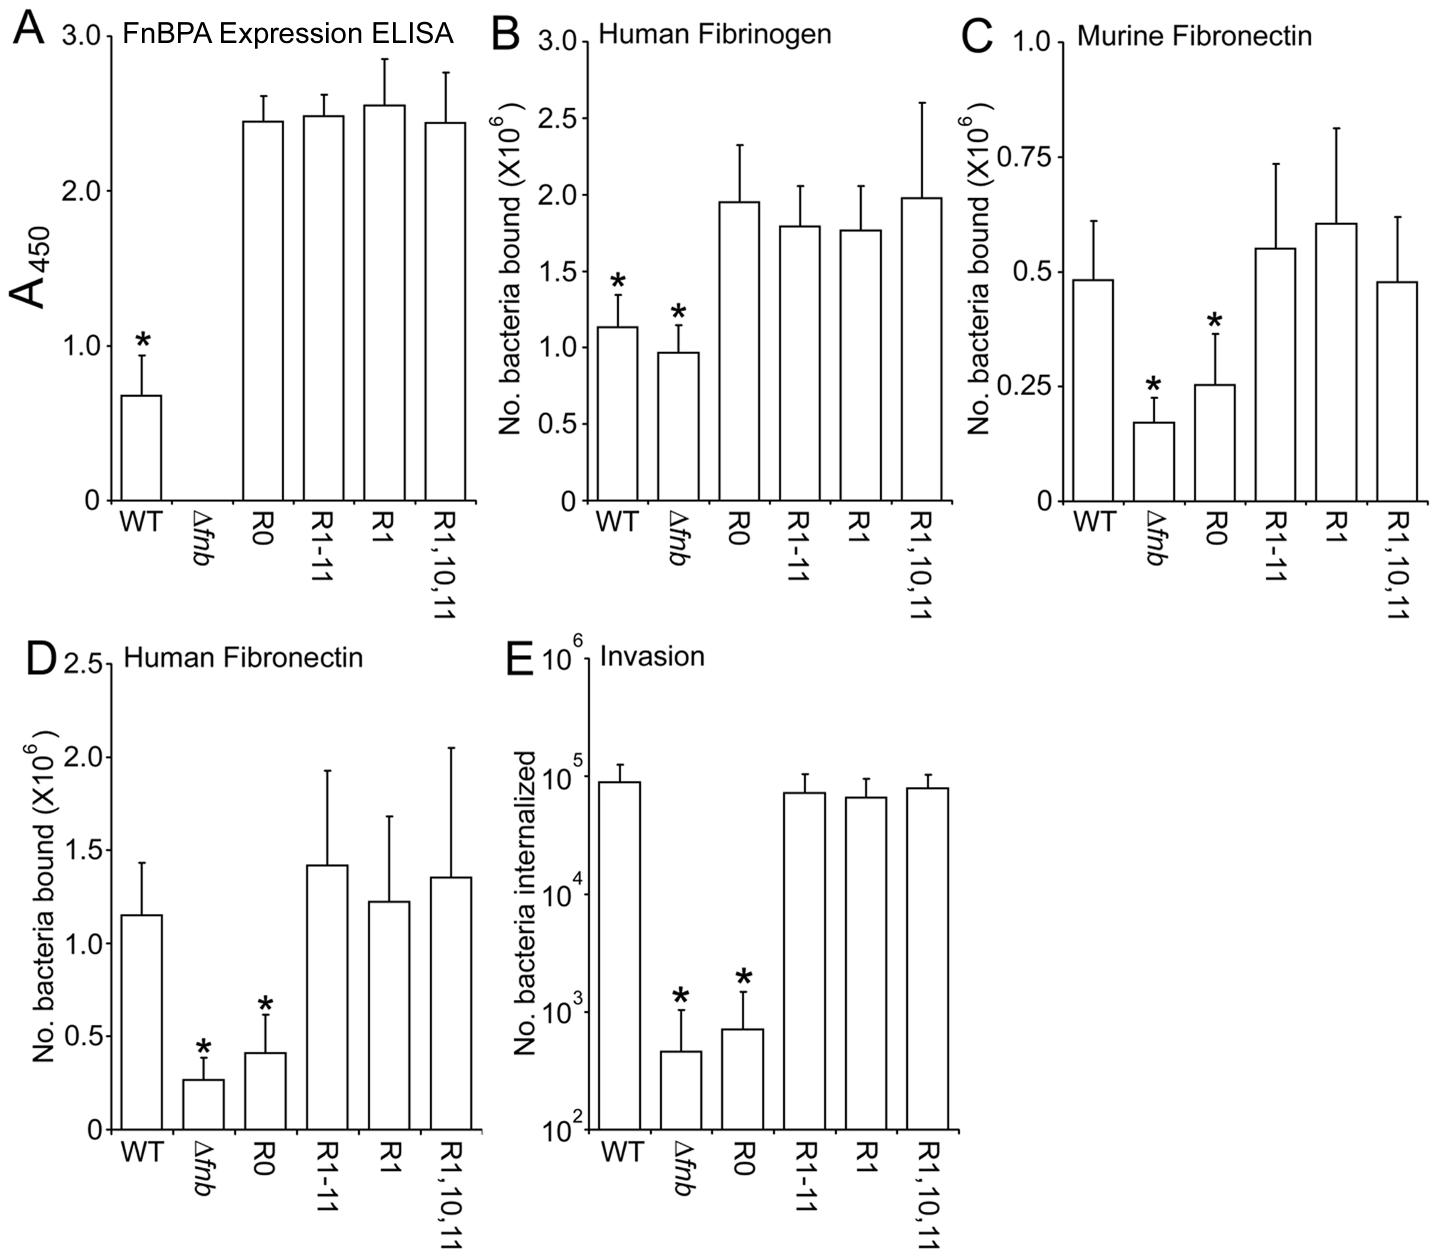 Expression levels and phenotype of <i>S. aureus</i> LS-1 expressing FnBPA variants.